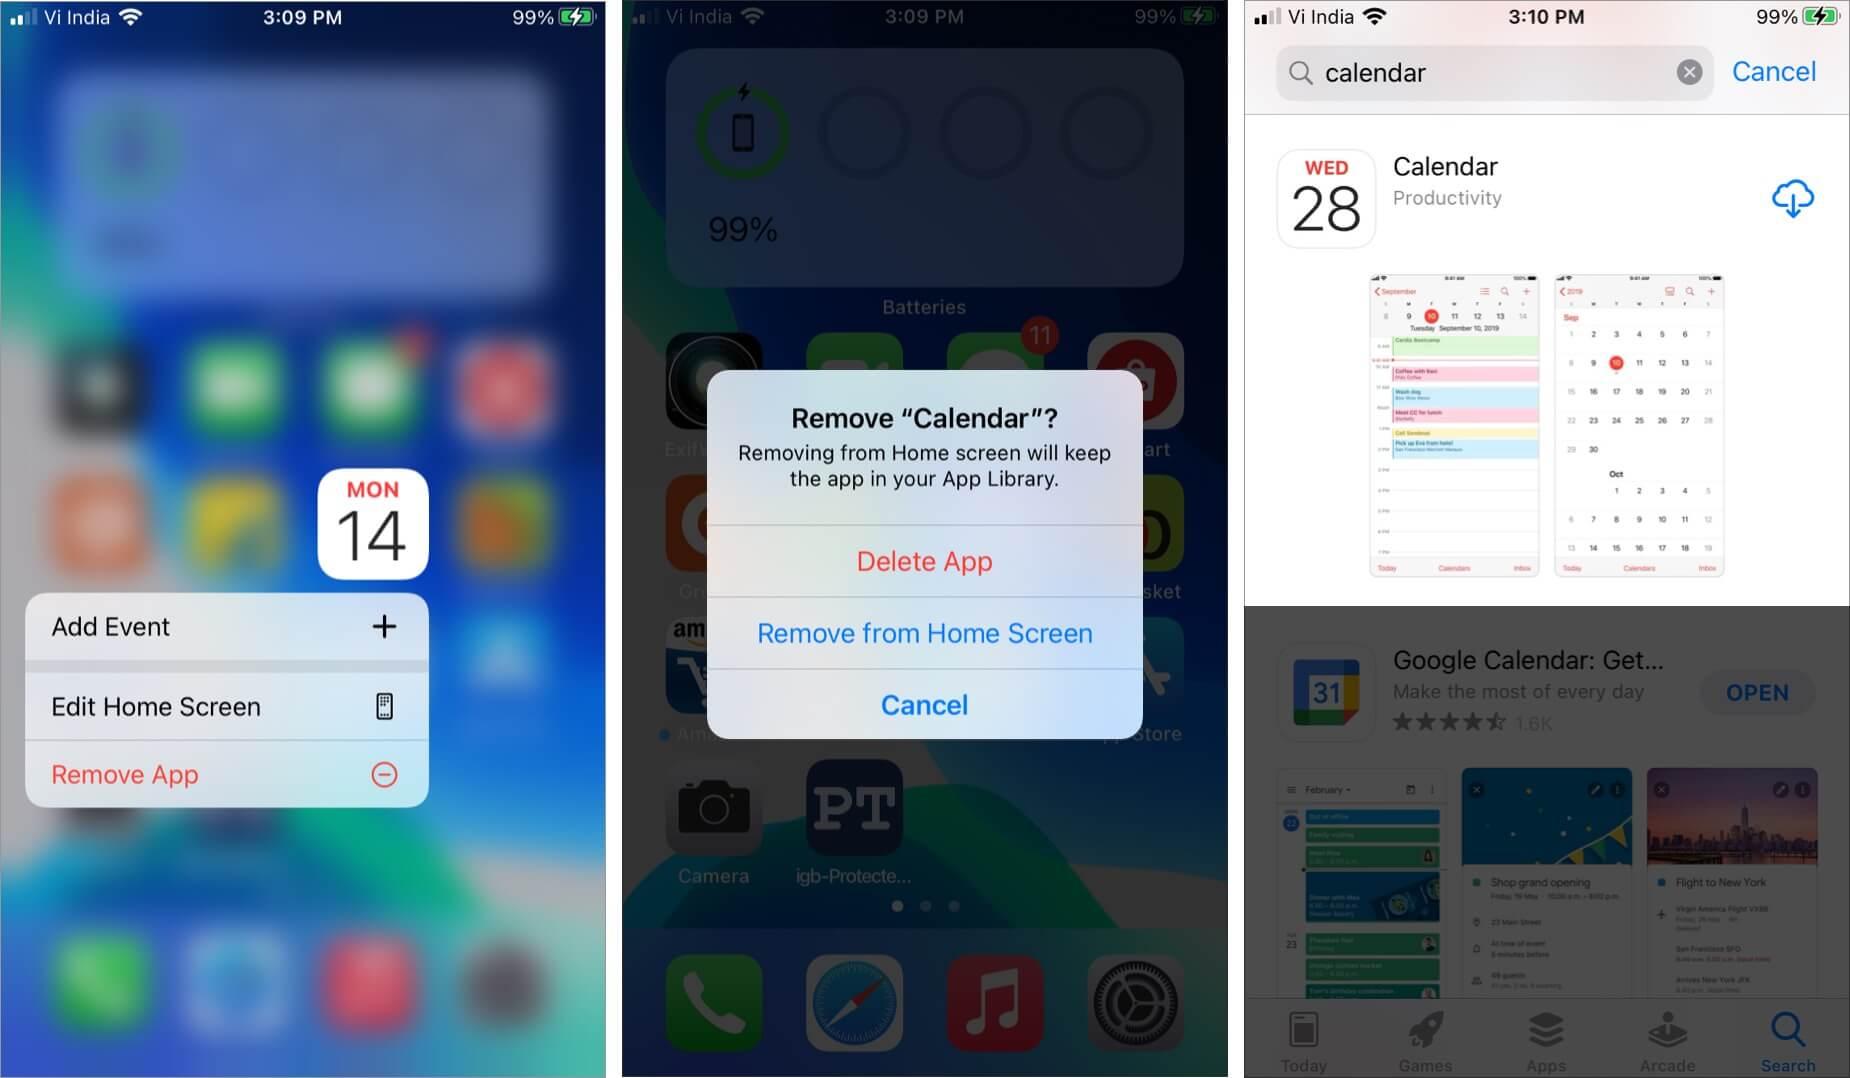 Uninstall and Reinstall Calendar App on iPhone